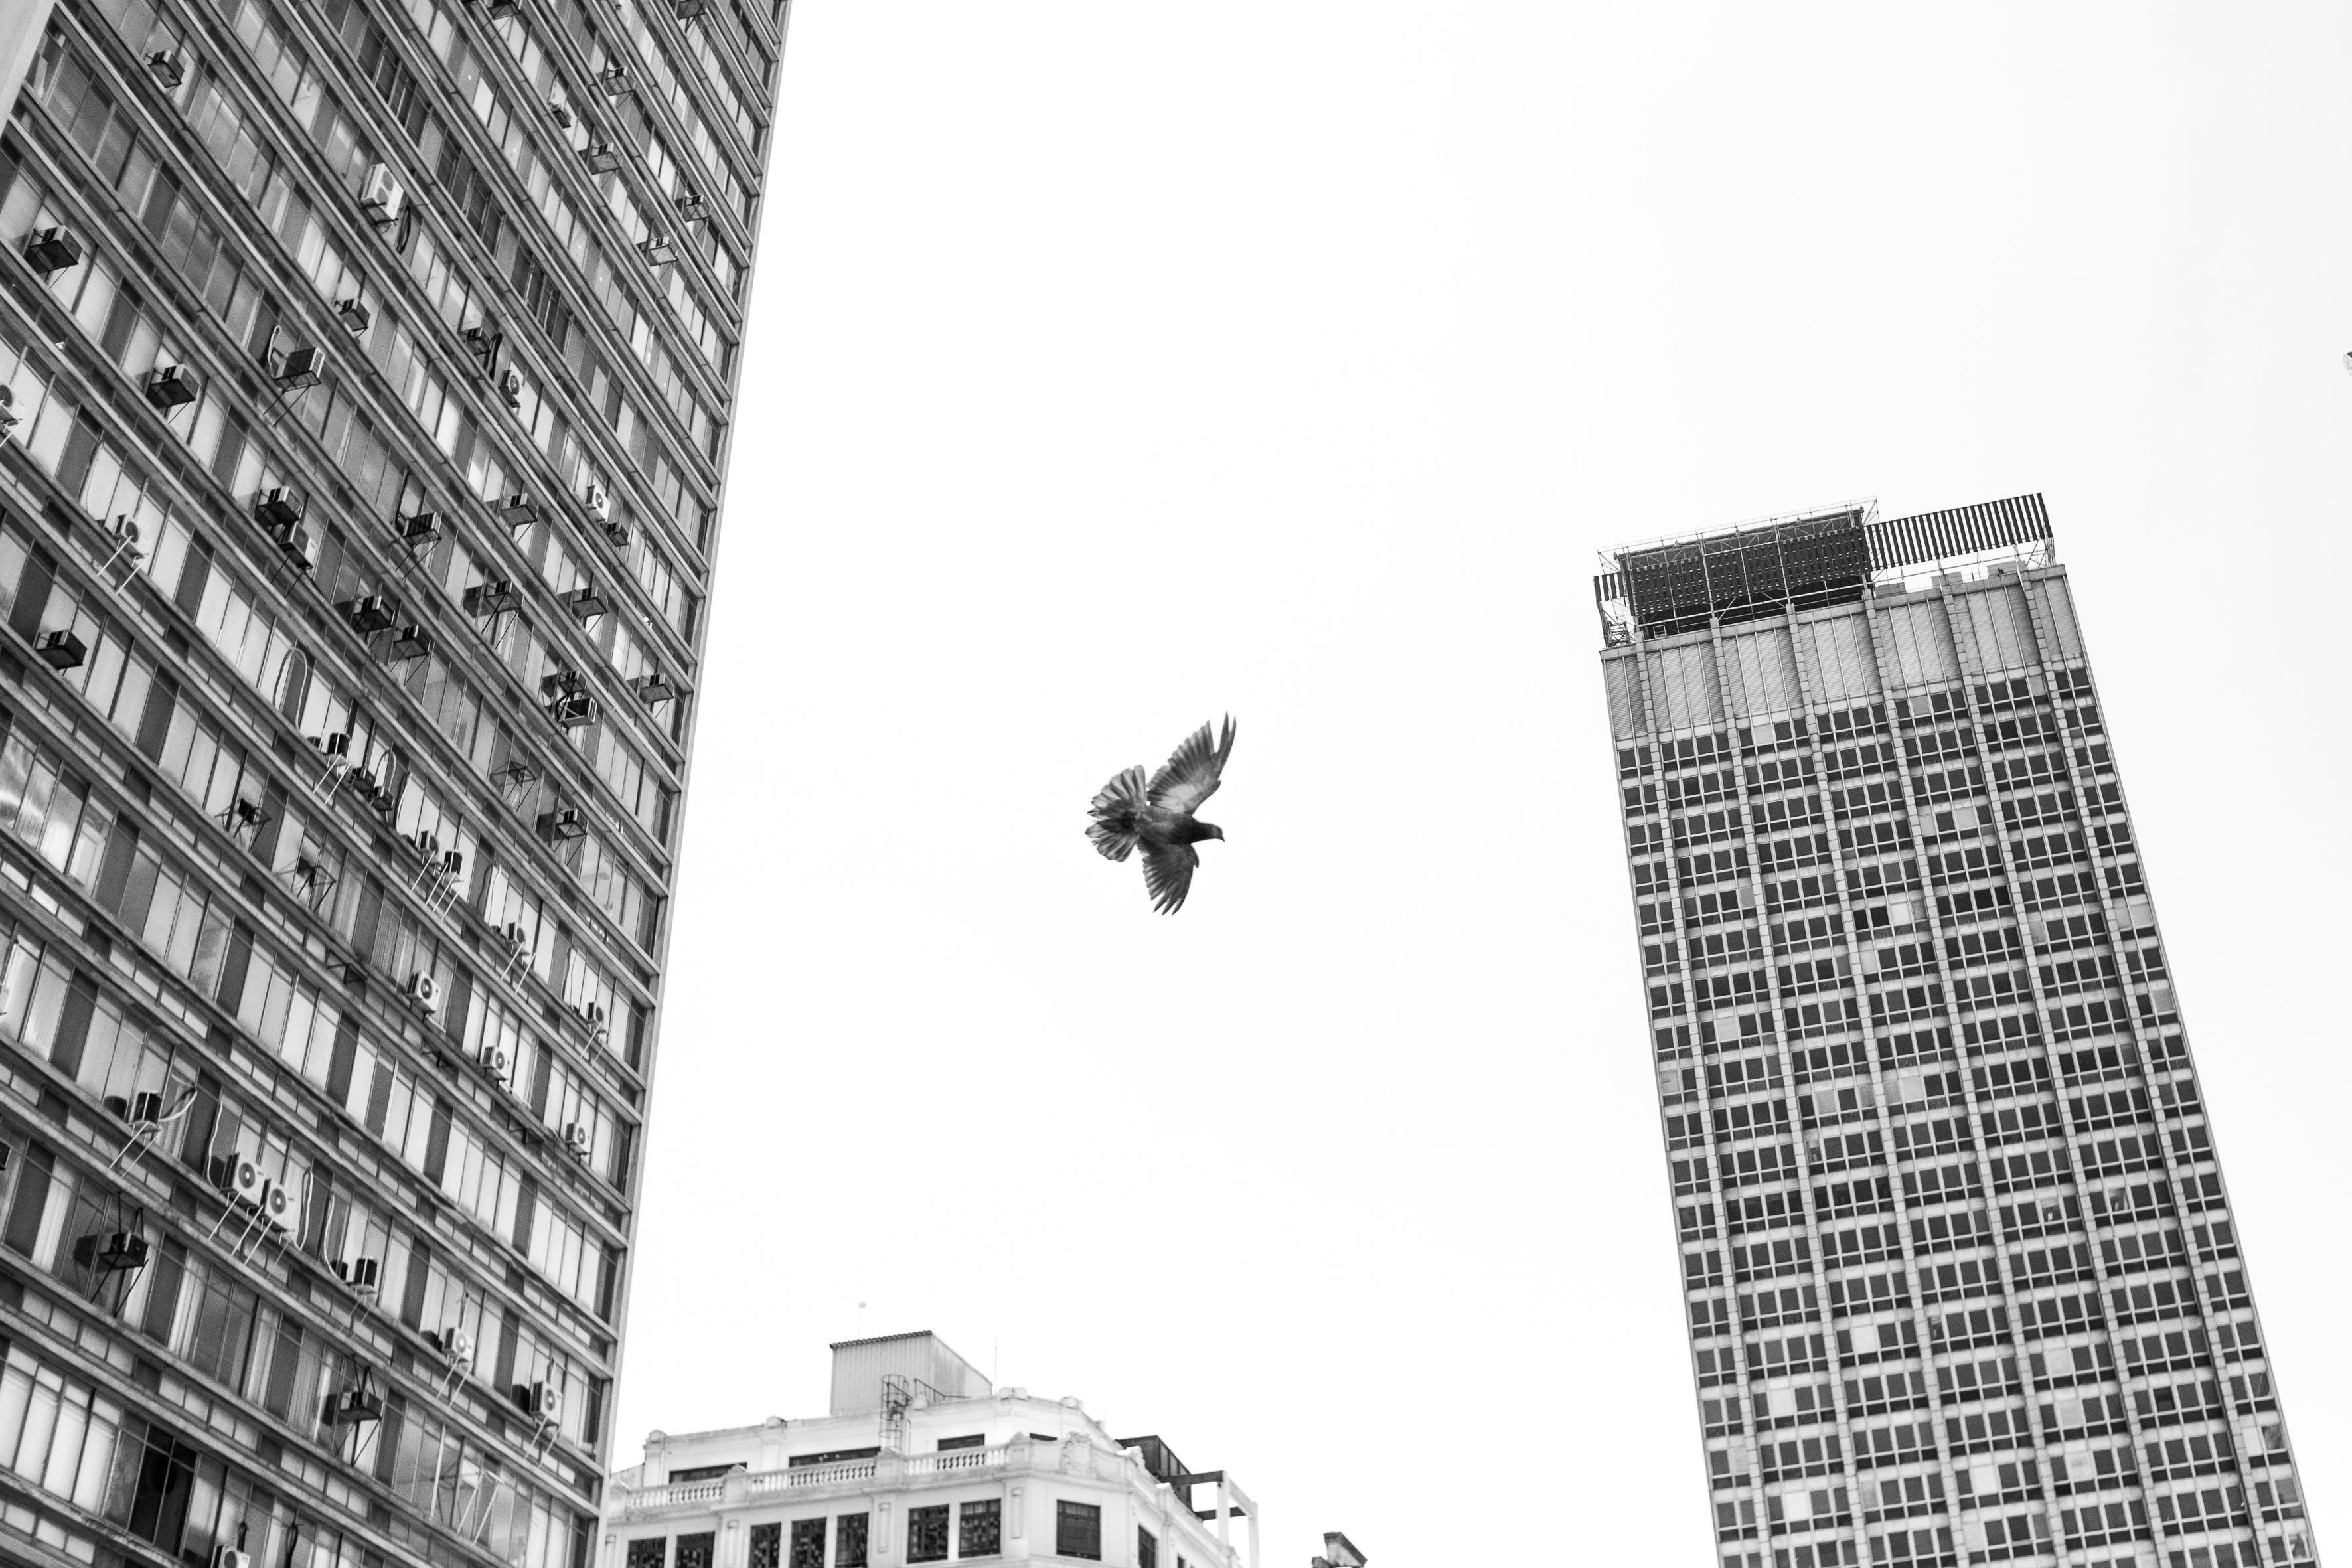 Monochrome Photo of Flying Bird